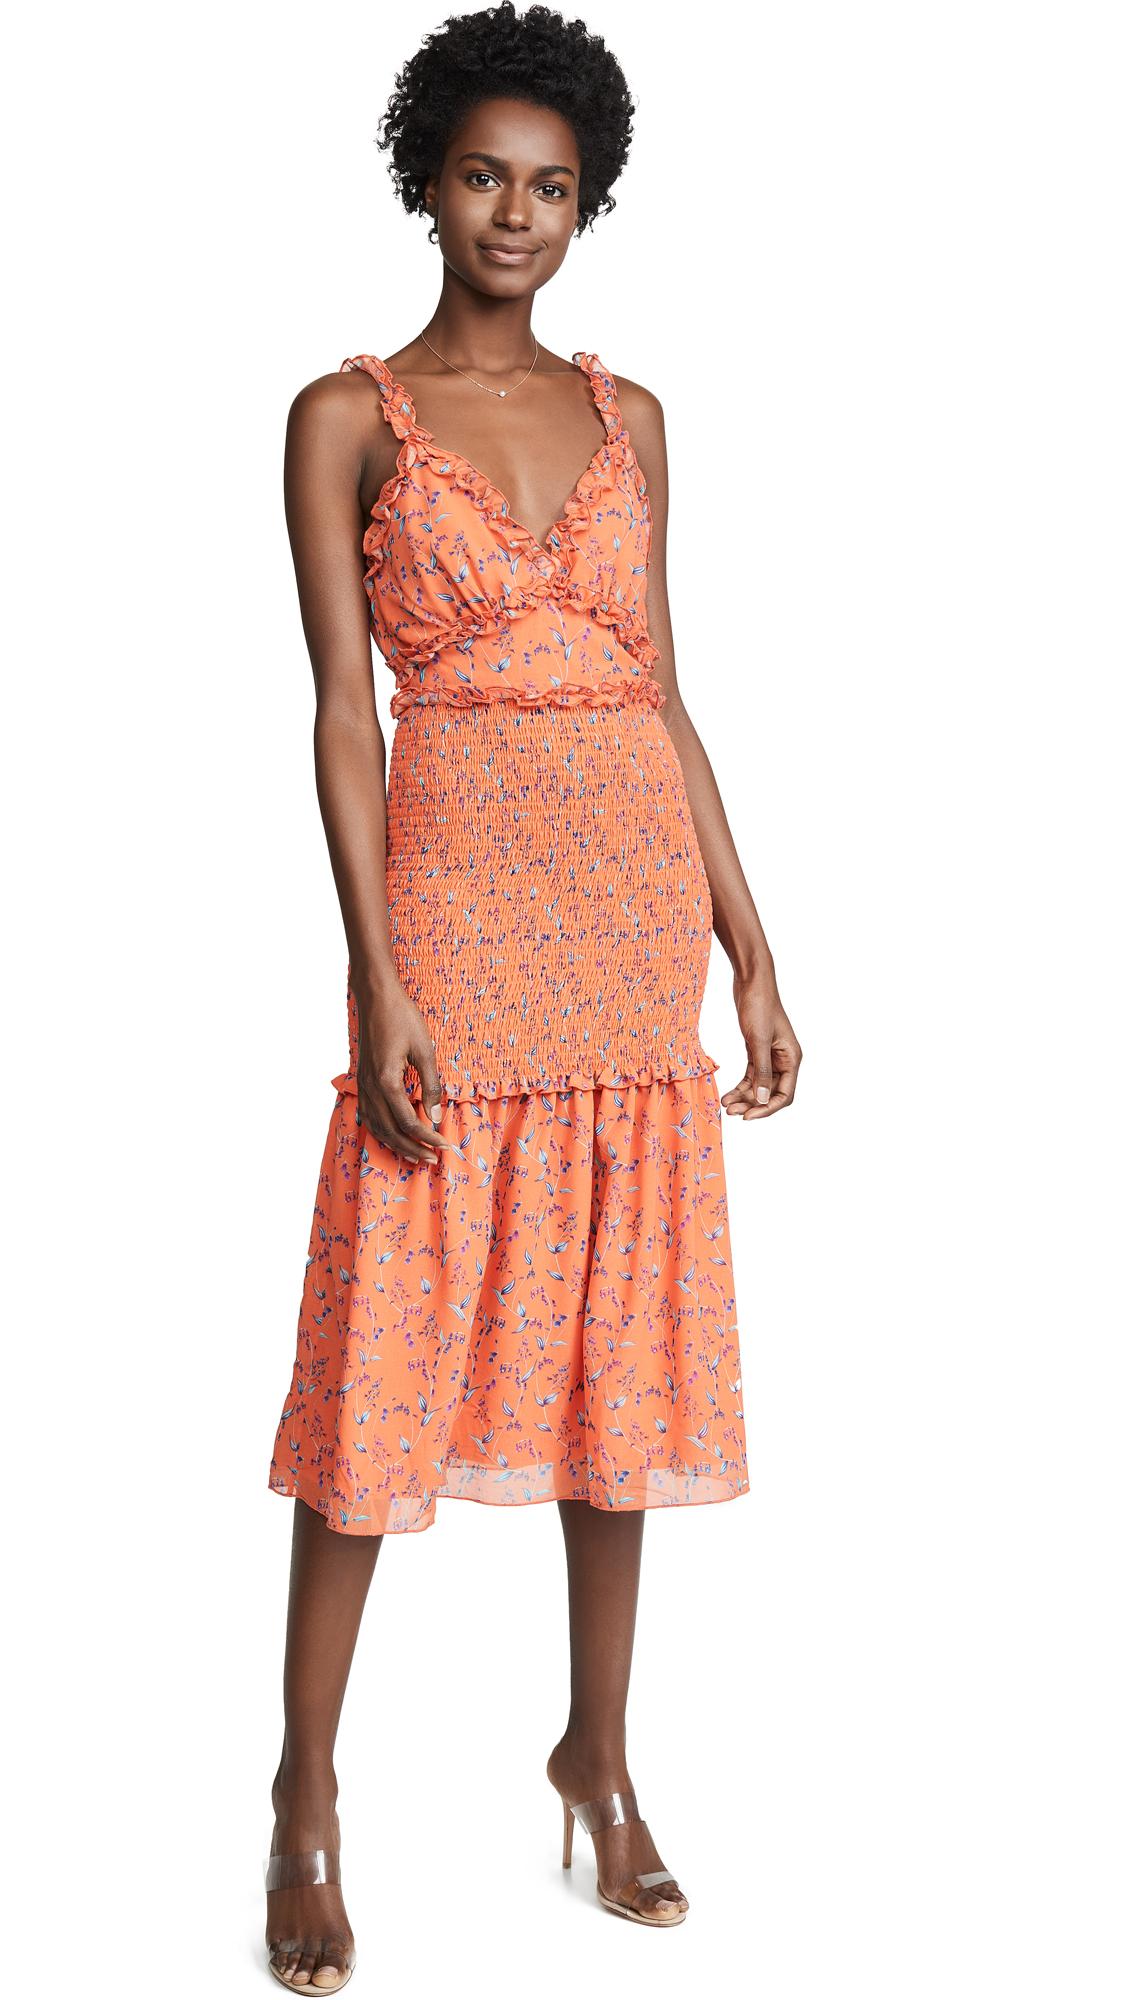 La Maison Talulah Daring Day Midi Dress - Bonnie Floral Print